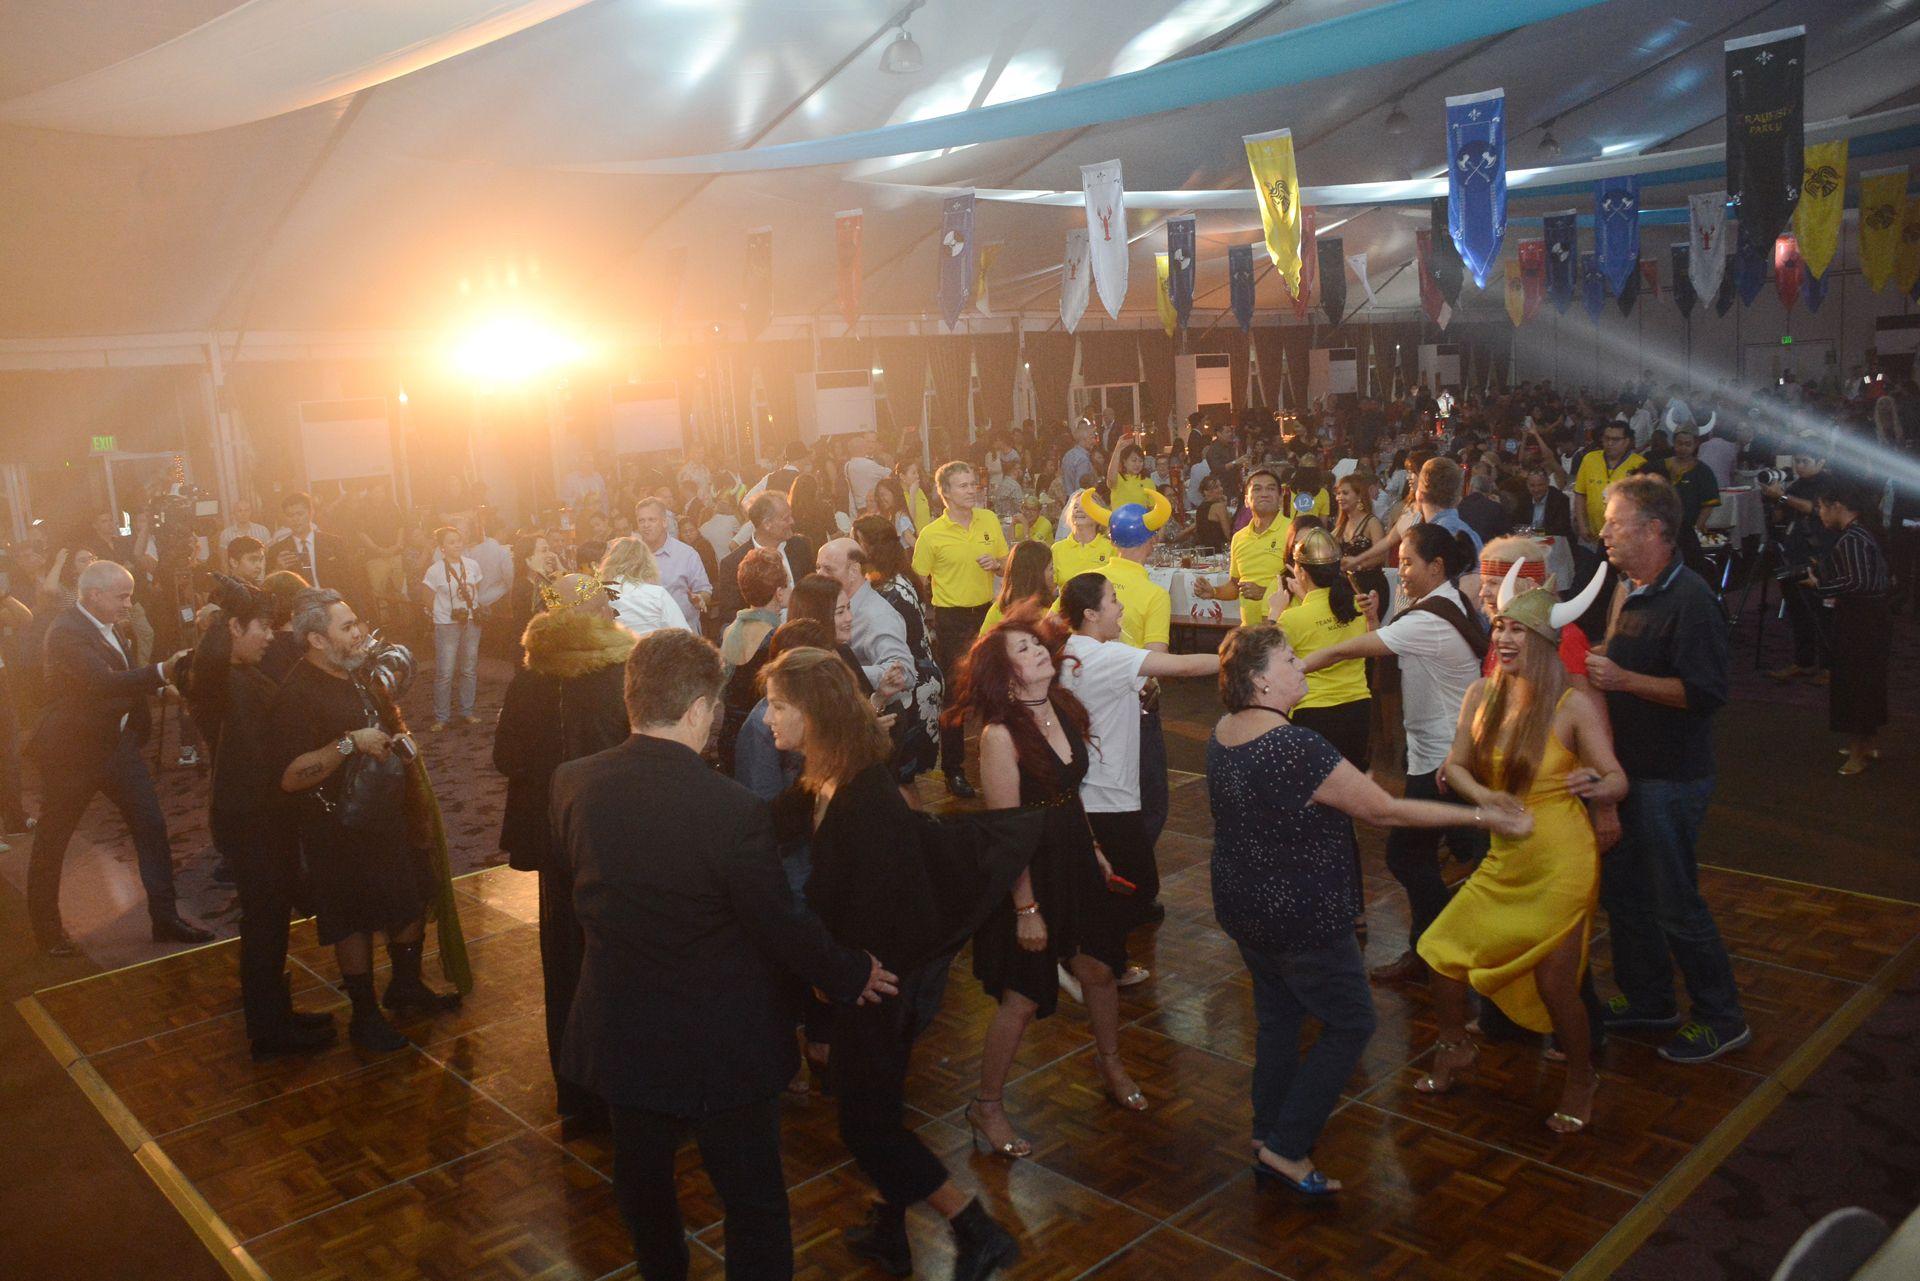 The crowd hitting the dance floor